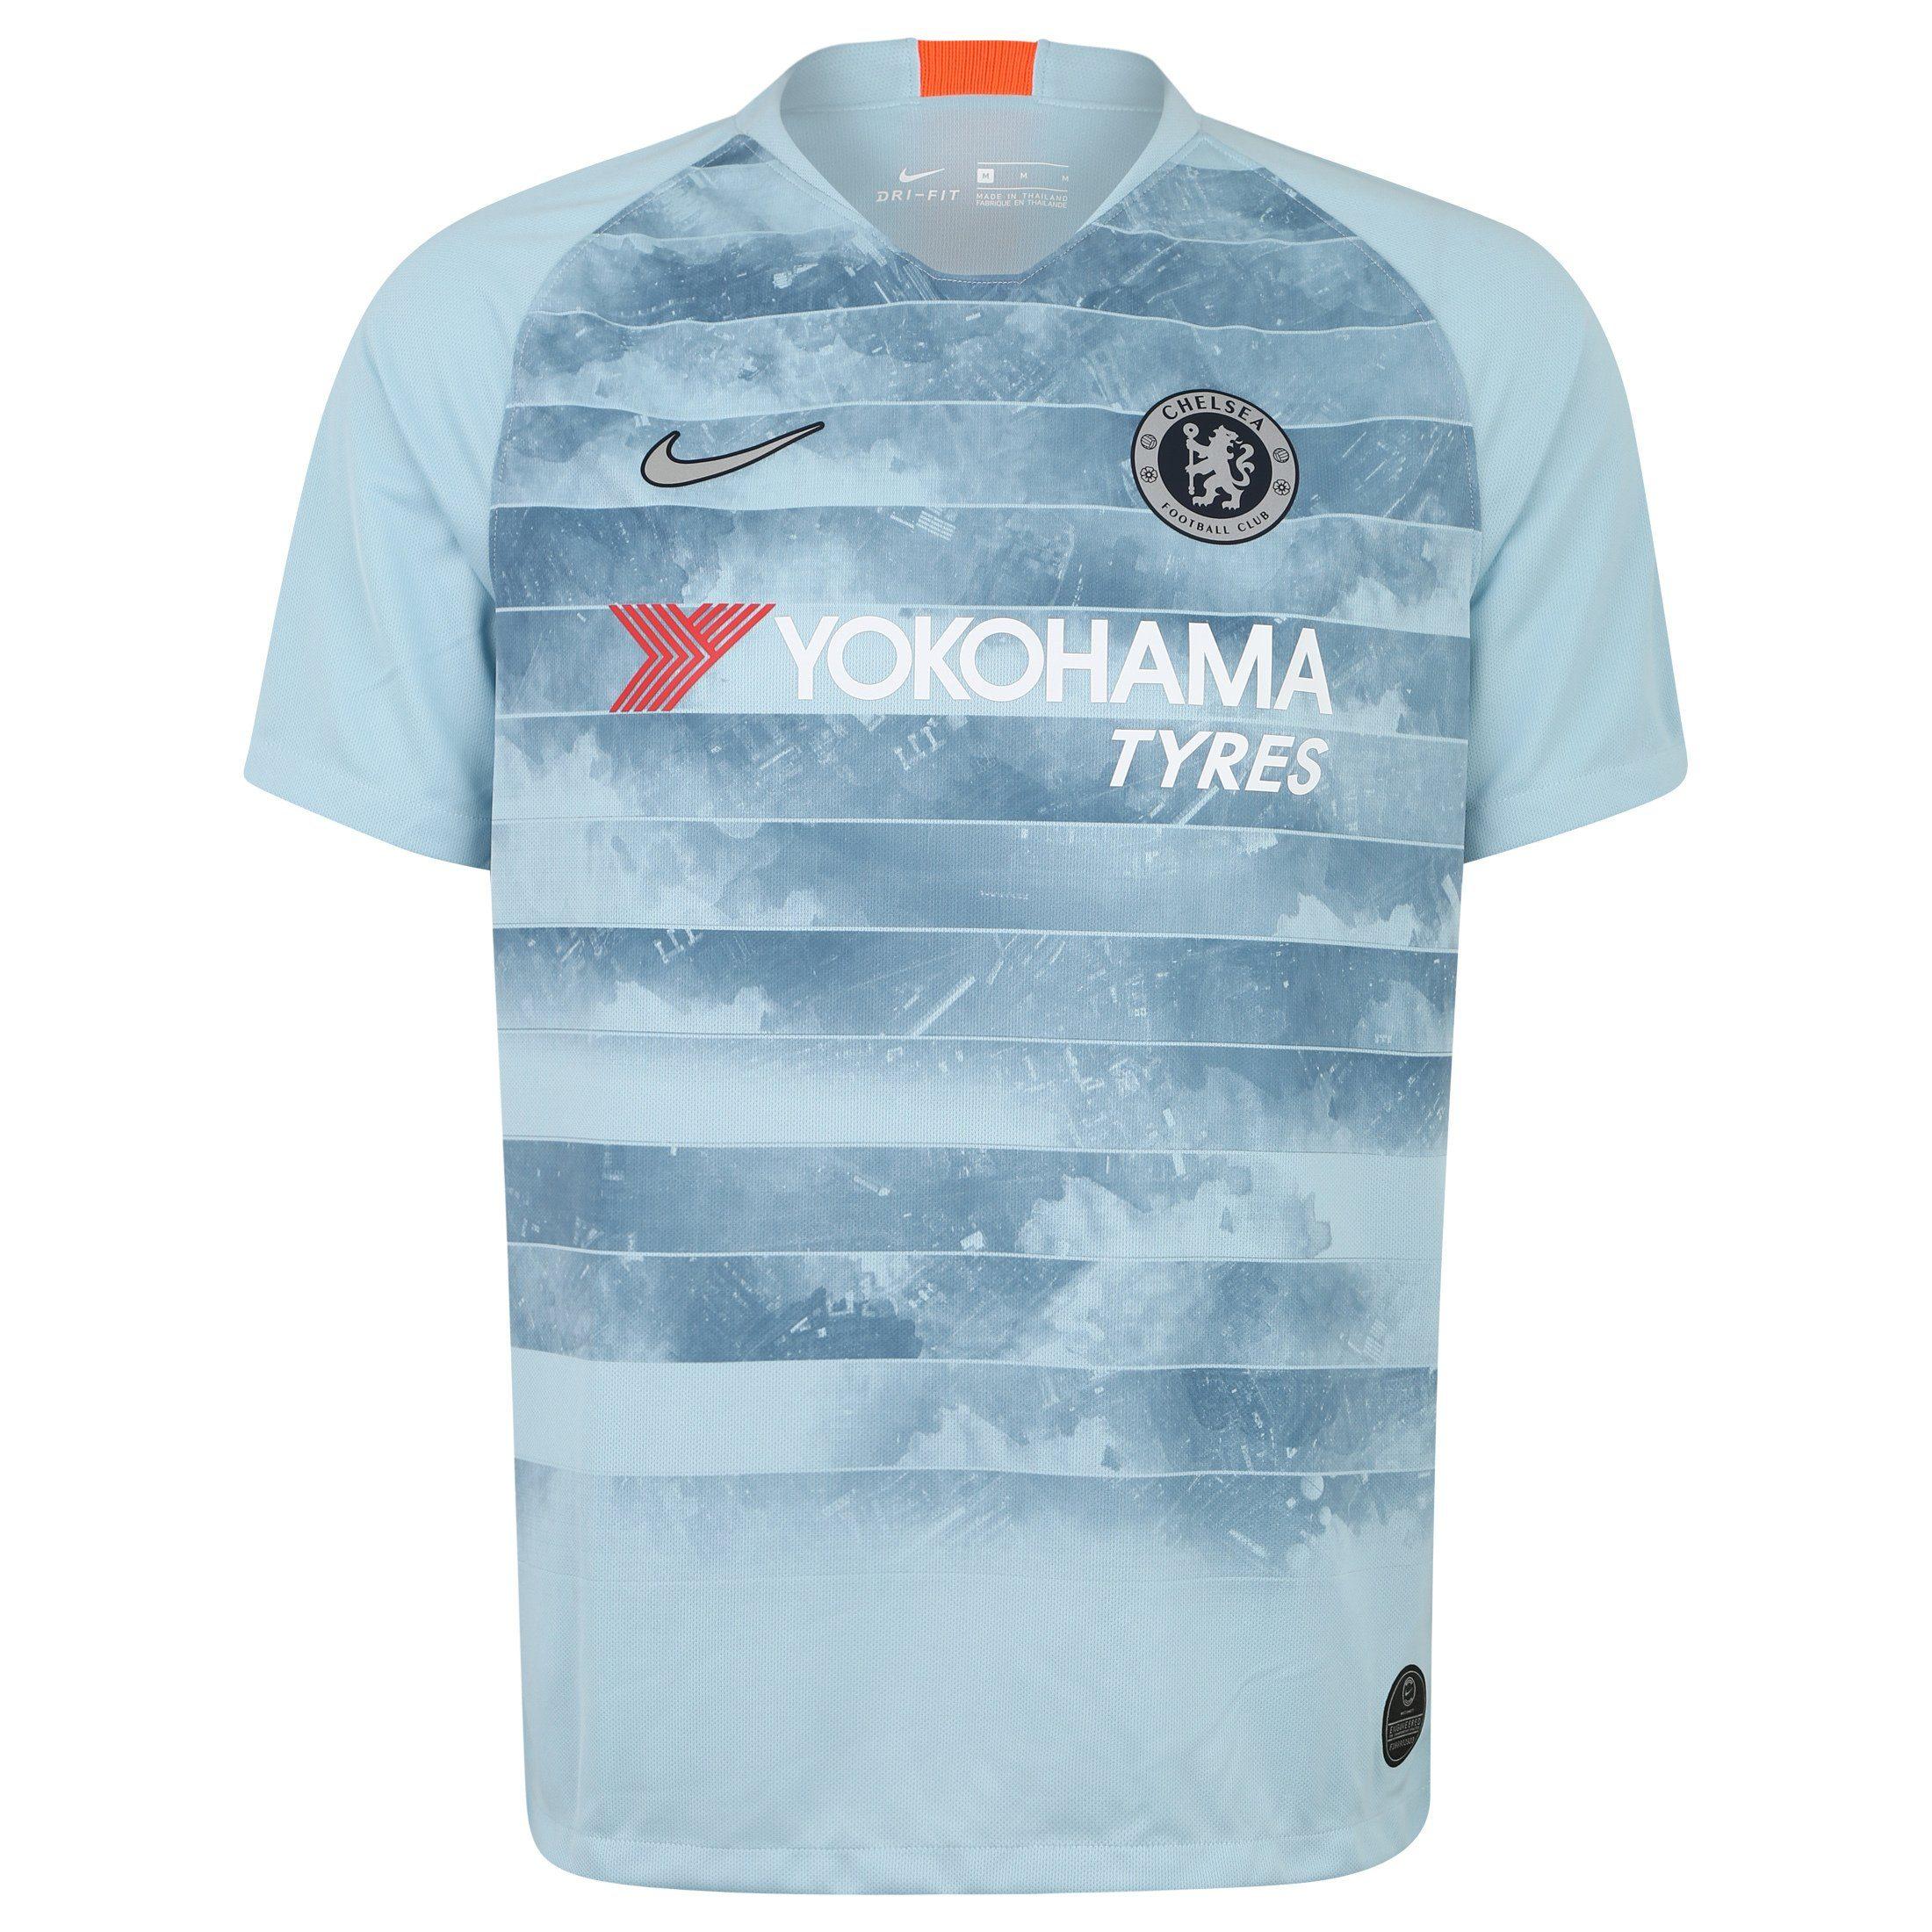 Nike Fußballtrikot Fc Chelsea 18/19 3rd | Sportbekleidung > Trikots | Blau | Nike